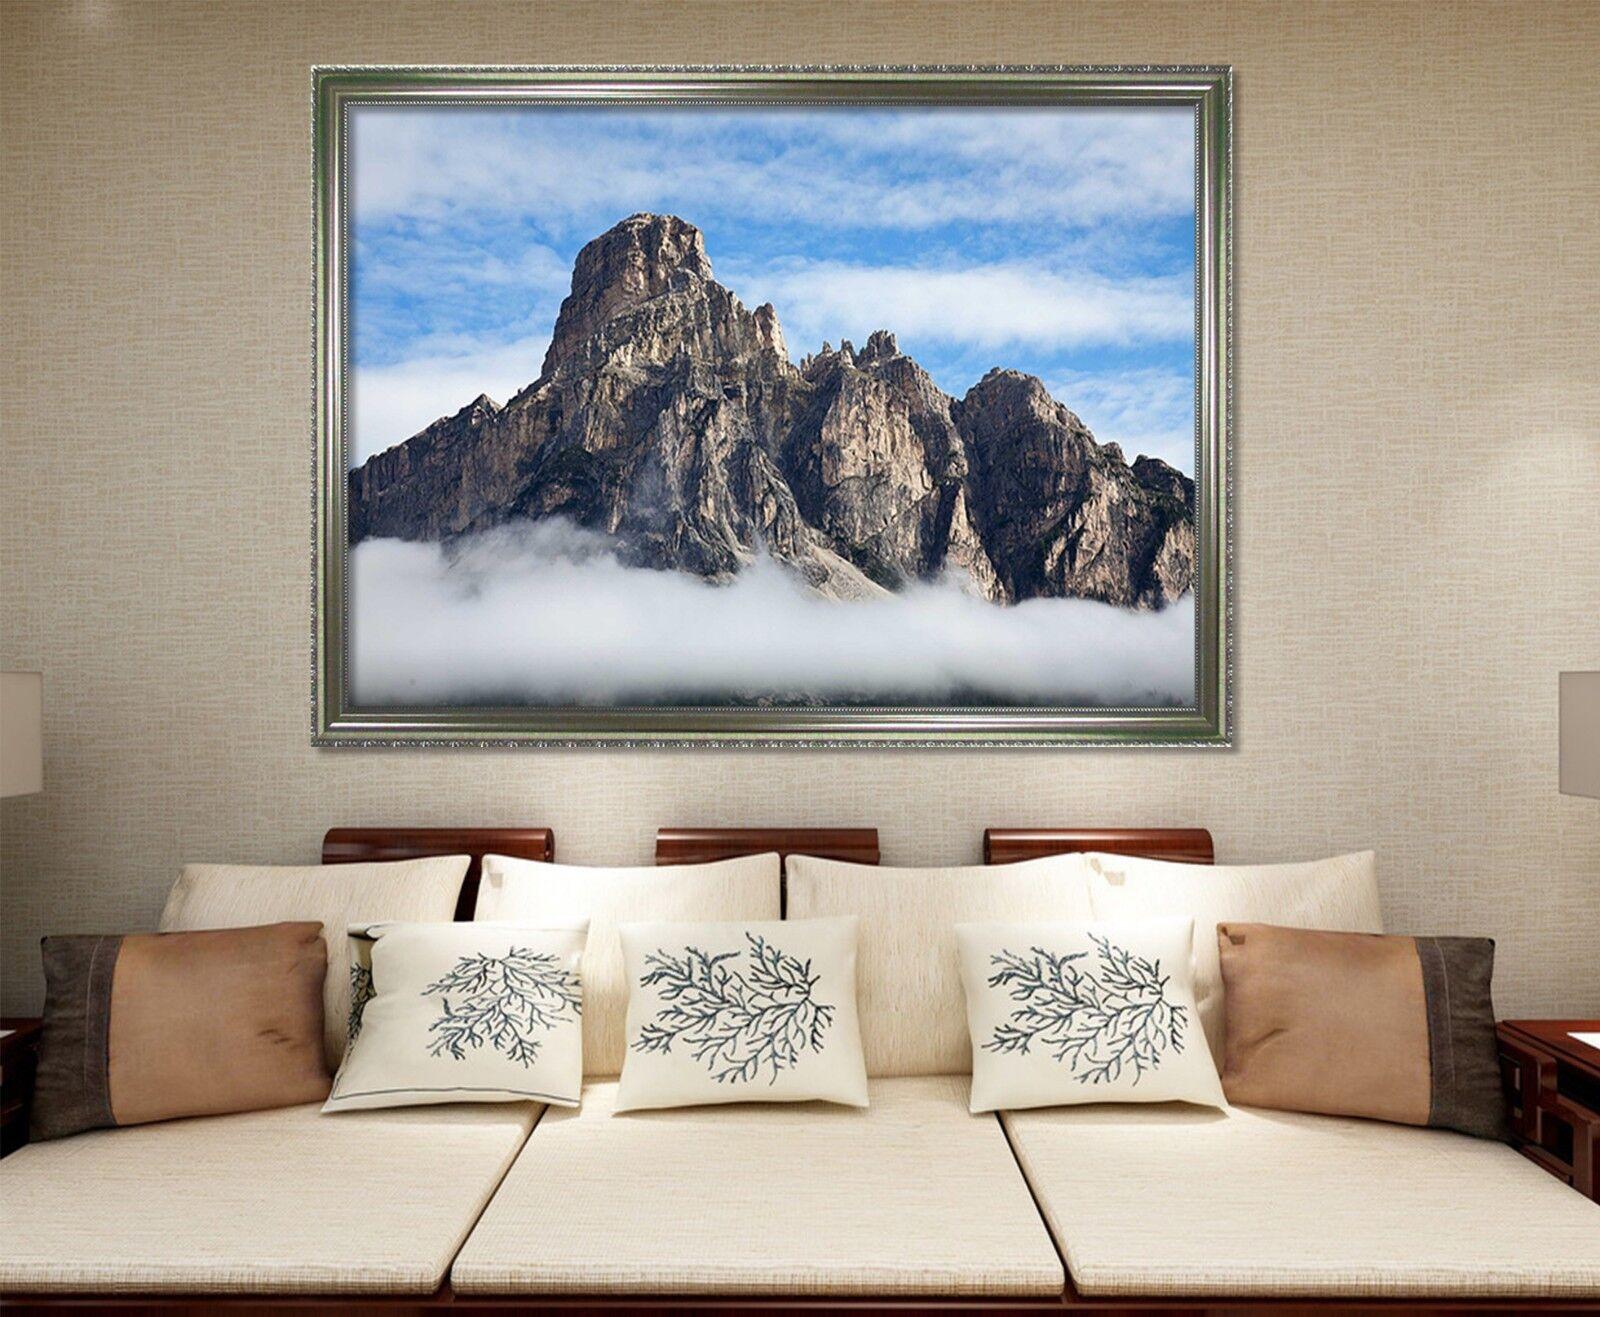 3D Berg Wolke 69 Gerahmt Poster Daheim Dekor Drucken Malerei Kunst AJ